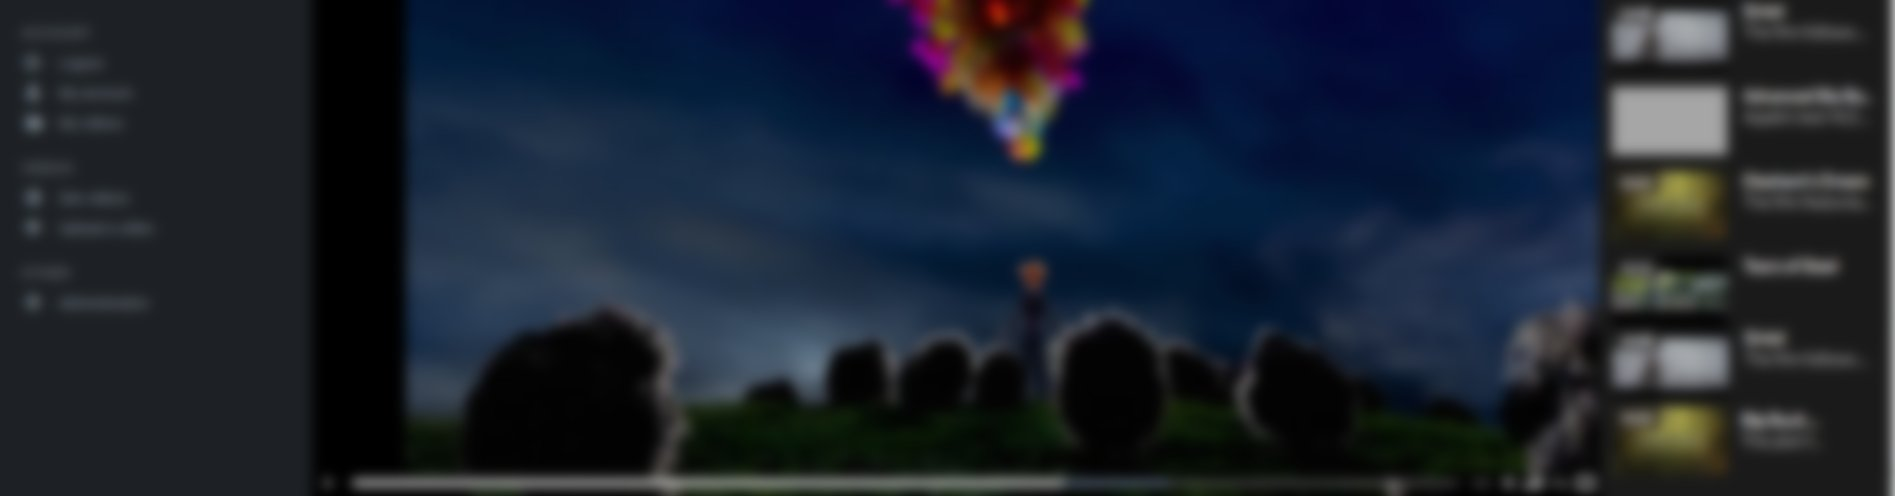 app/assets/img/player-peertube-flou.jpg